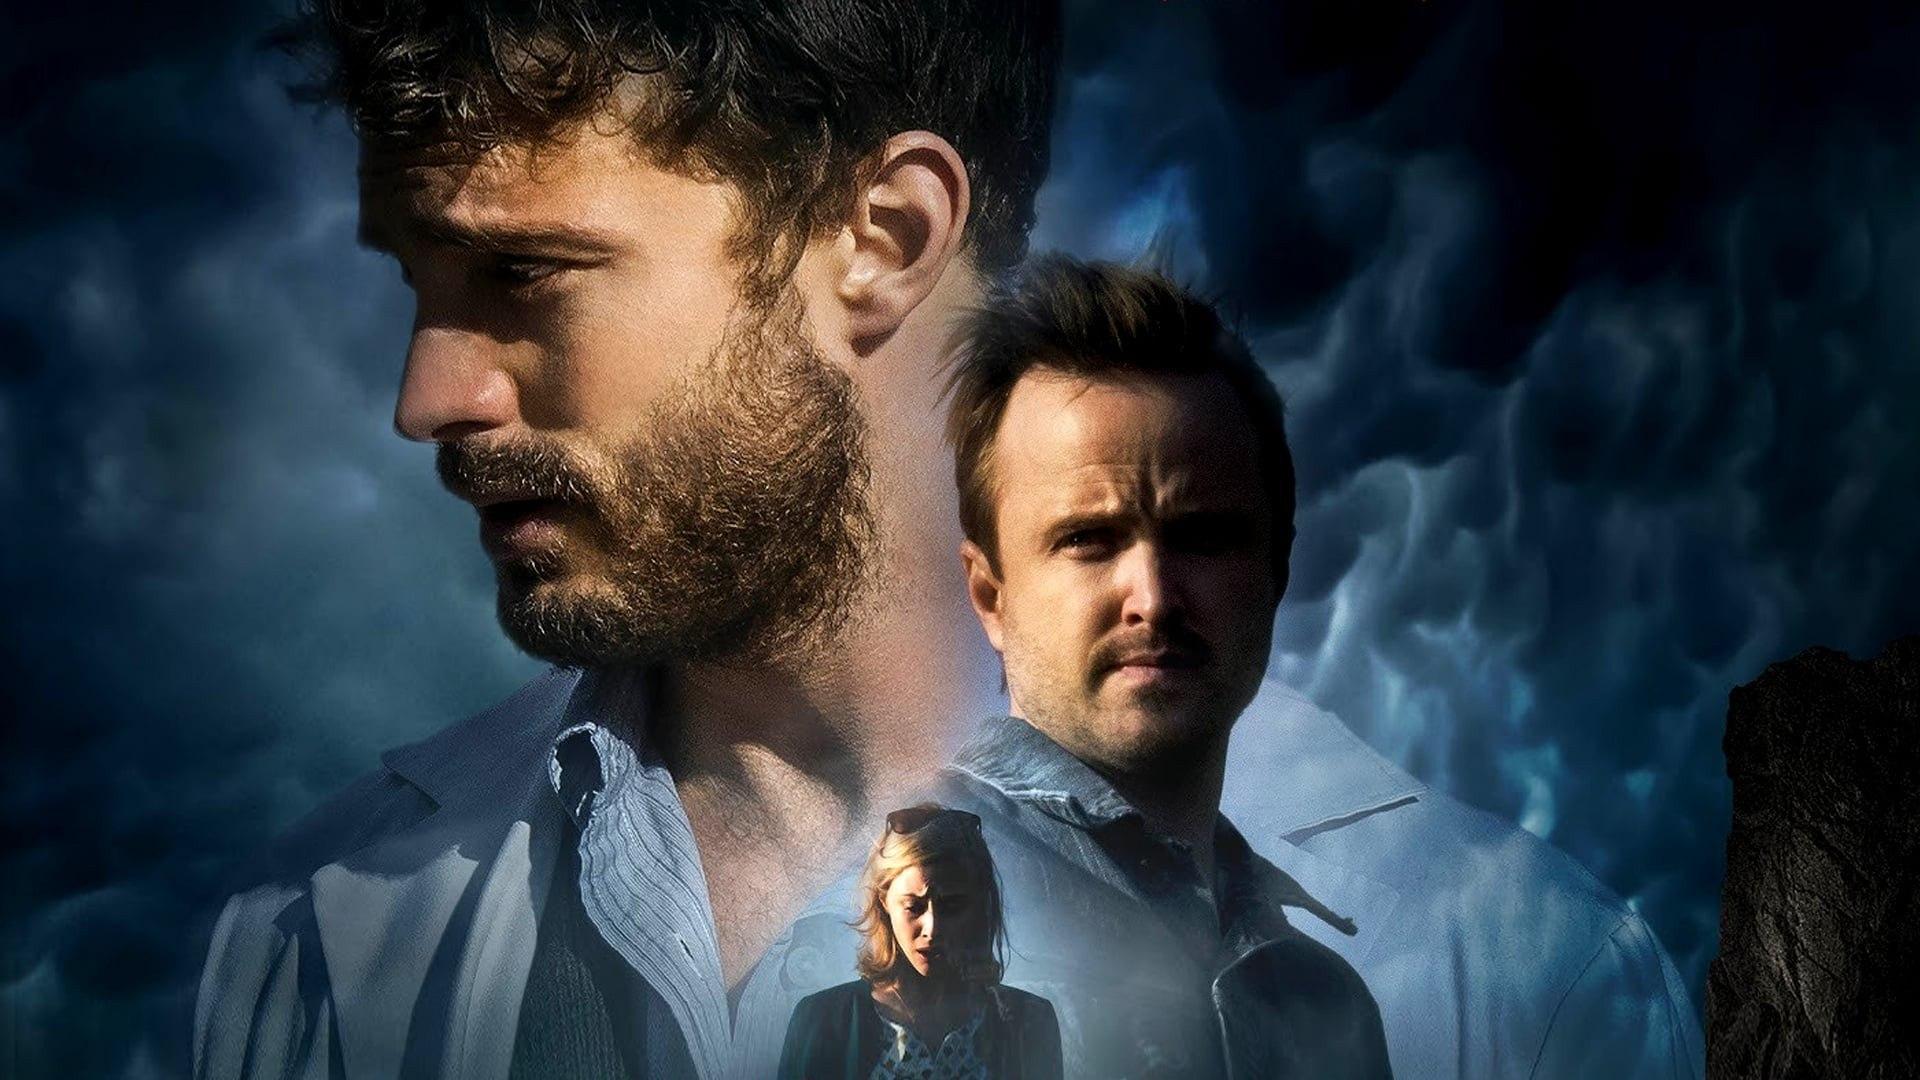 Giovedi 15 Ottobre 2020 Sky Cinema HD, The 9th Life Of Louis Drax